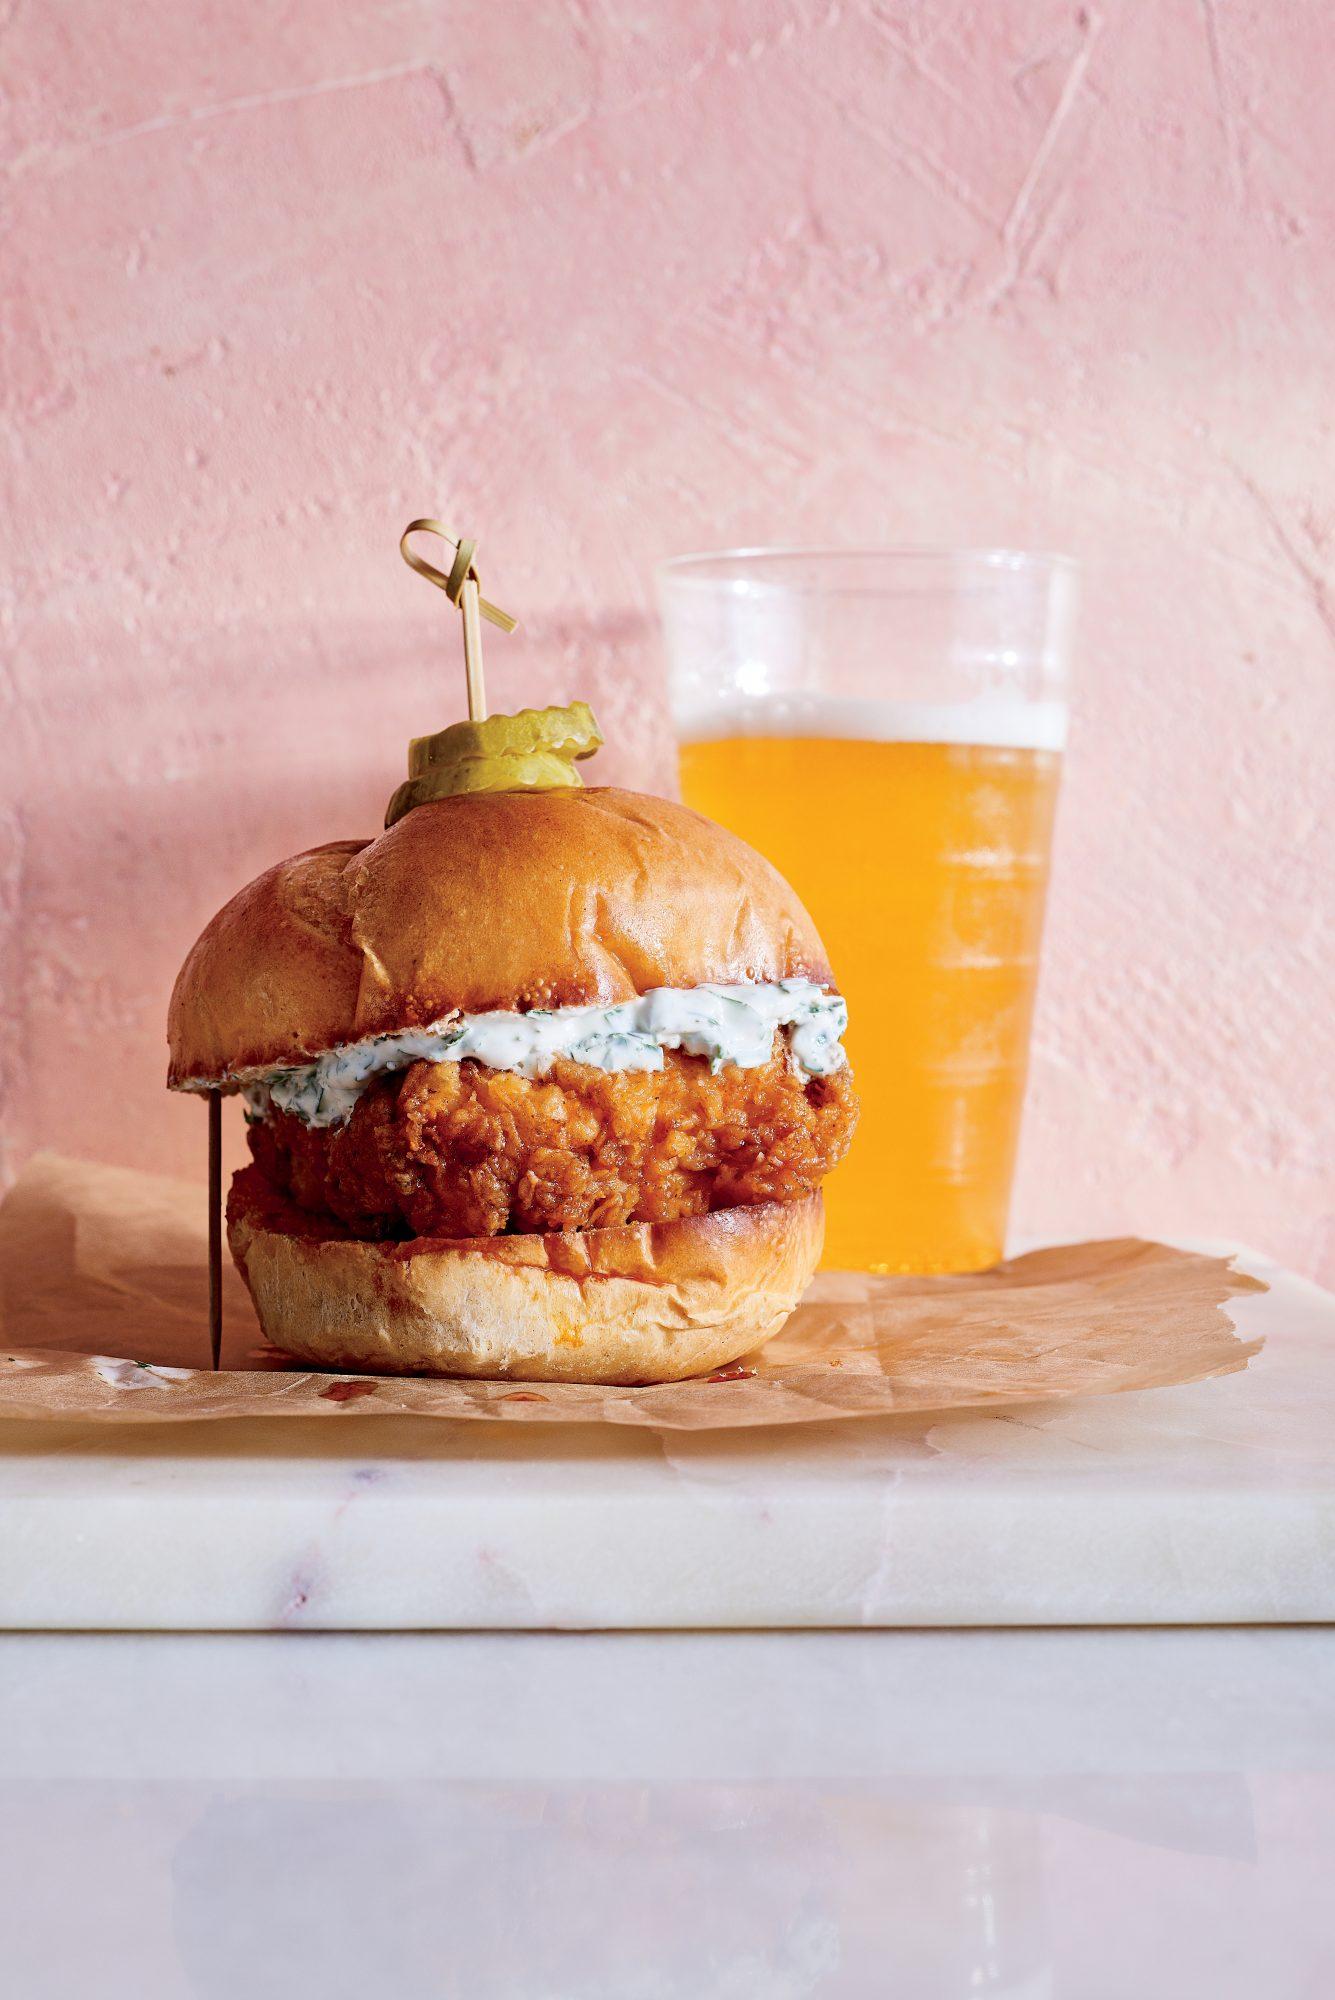 Buttermilk-Fried Nashville Hot Fish Sandwich